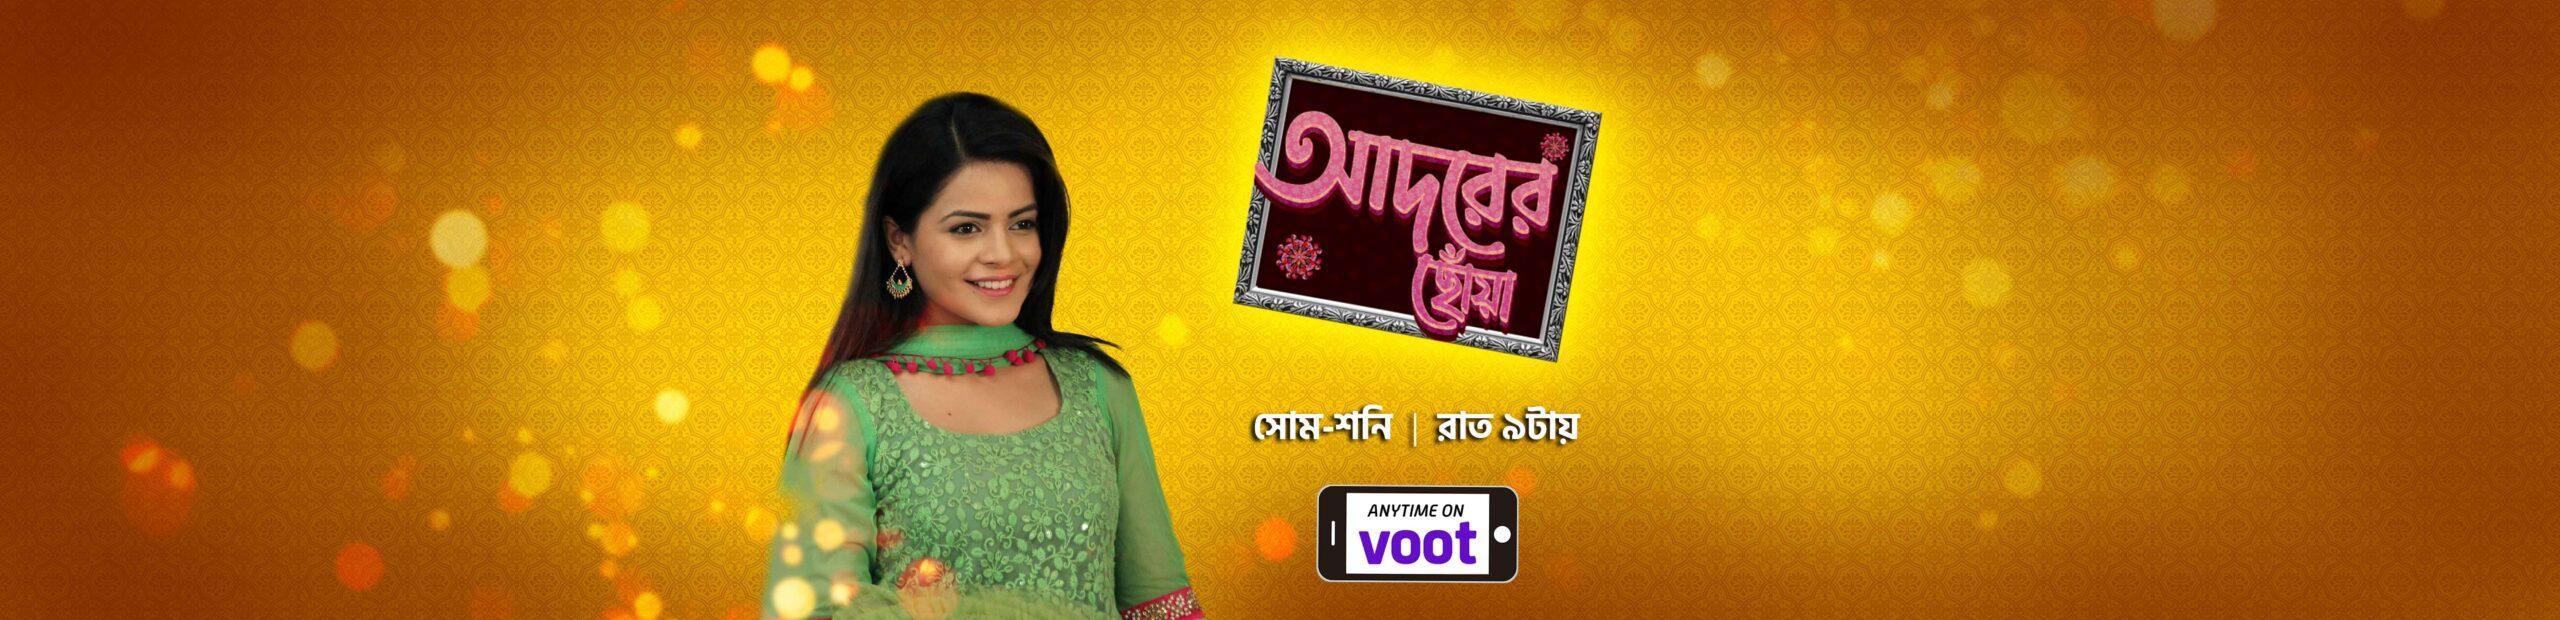 Adorer Choya Banner 1 1 copy